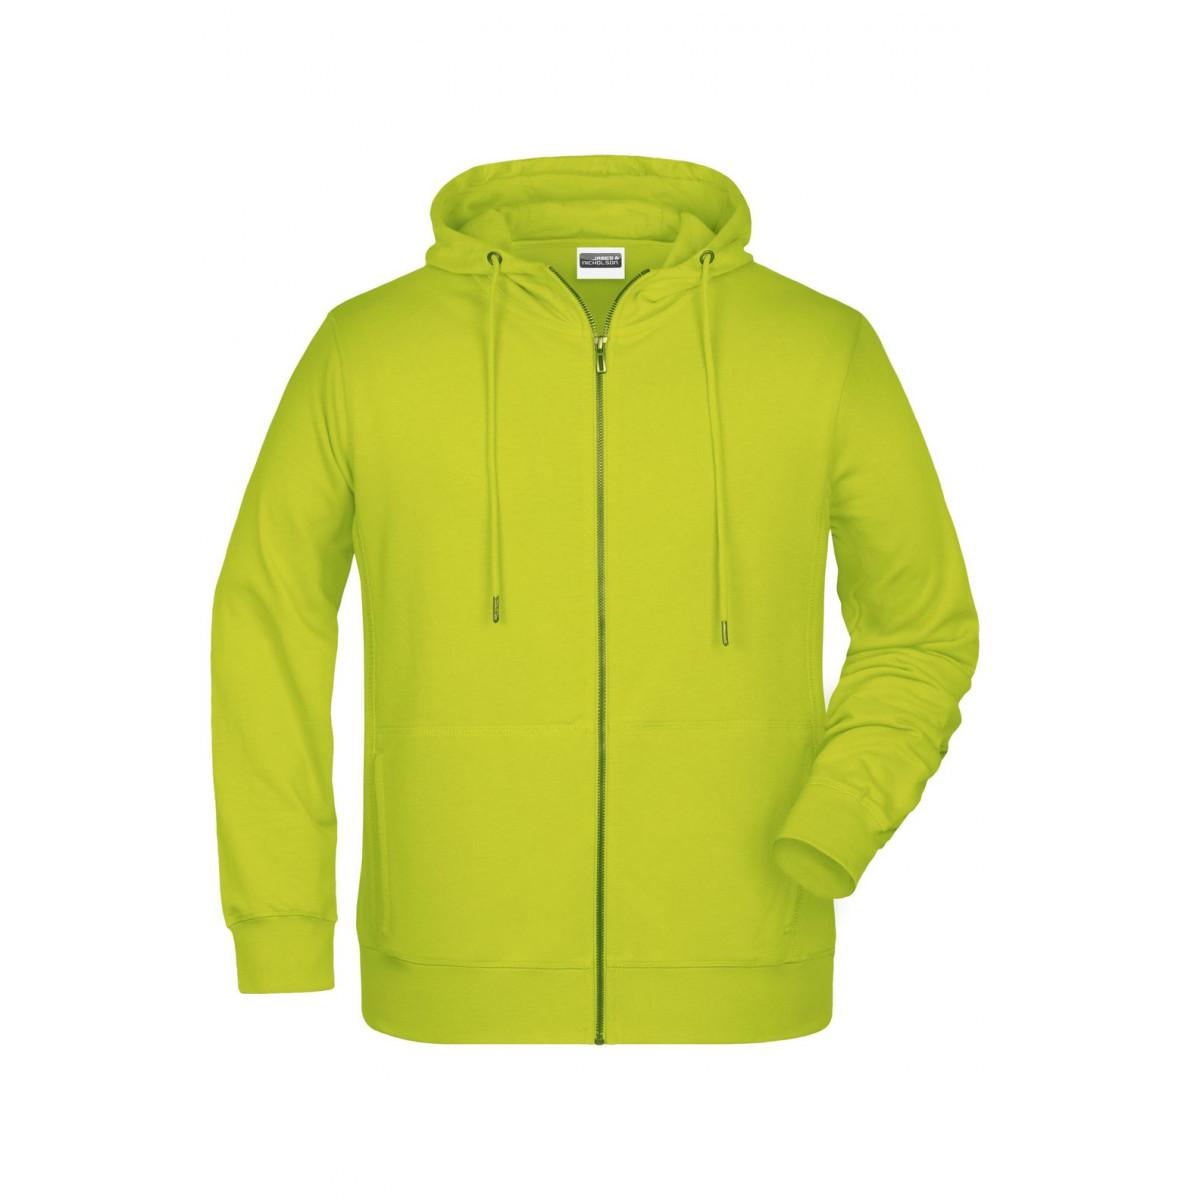 Толстовка мужская 8026 Mens Zip Hoody - Ярко-желтый